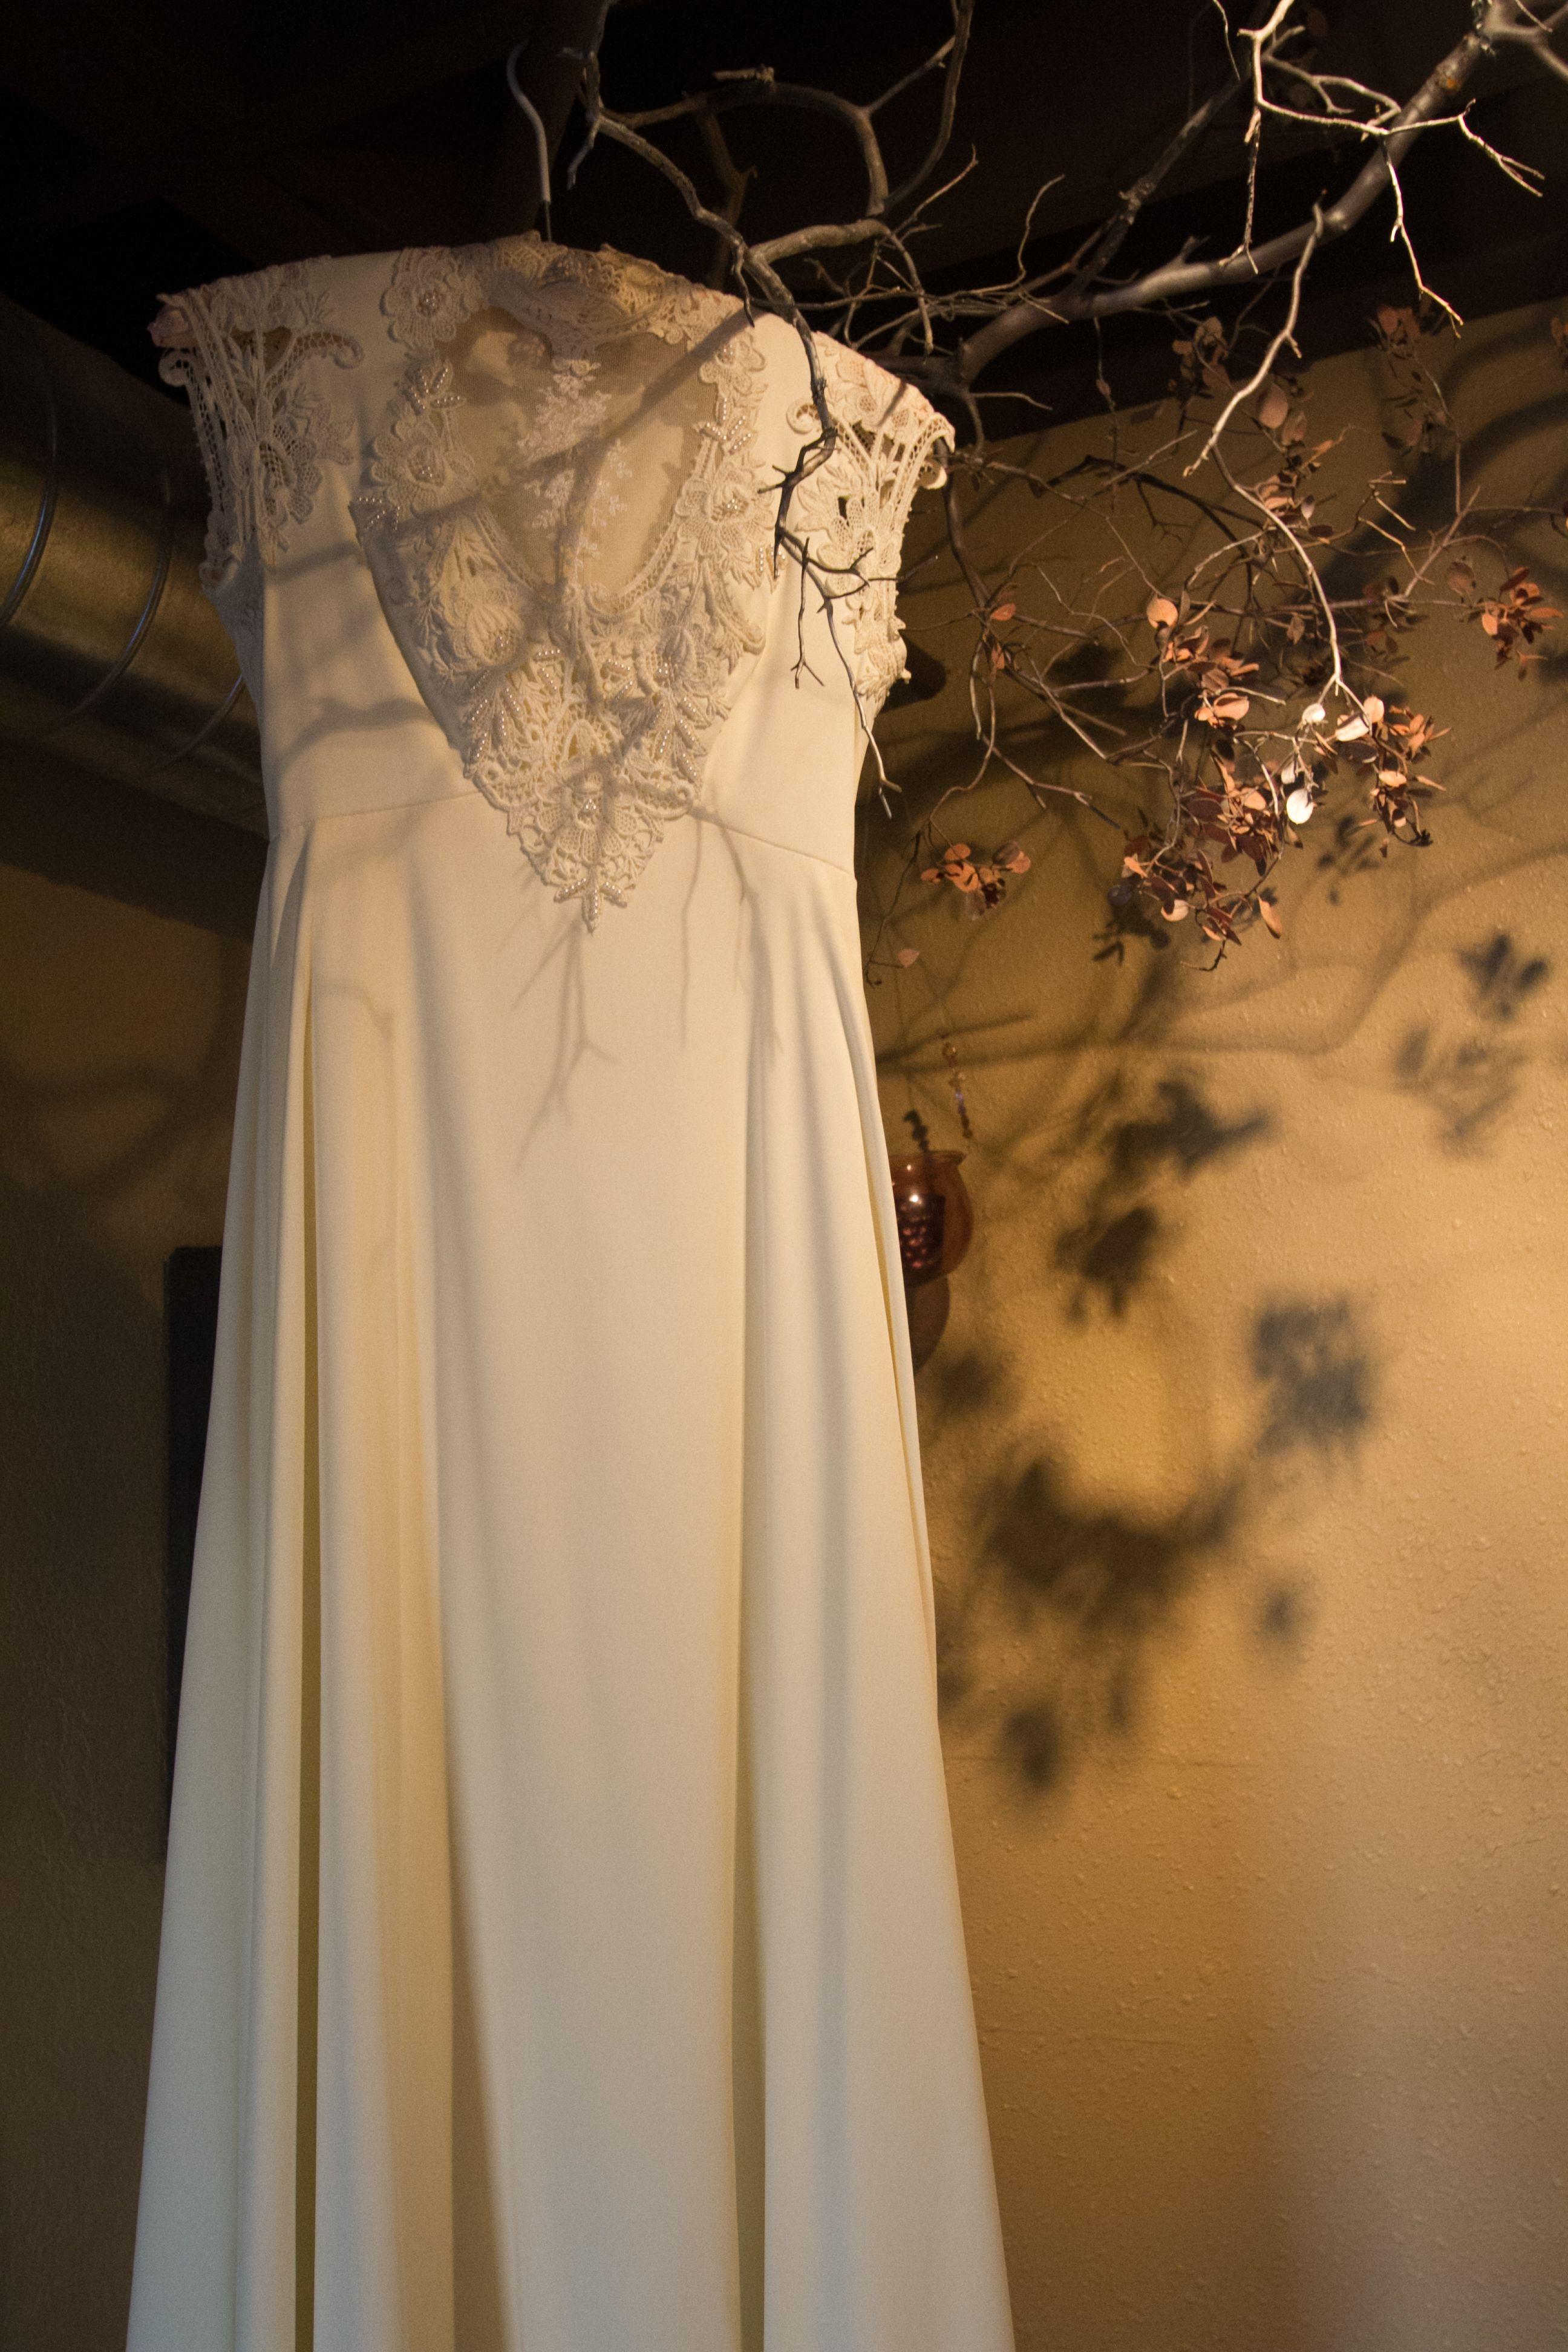 Rustic Wedding - Wedding Dress